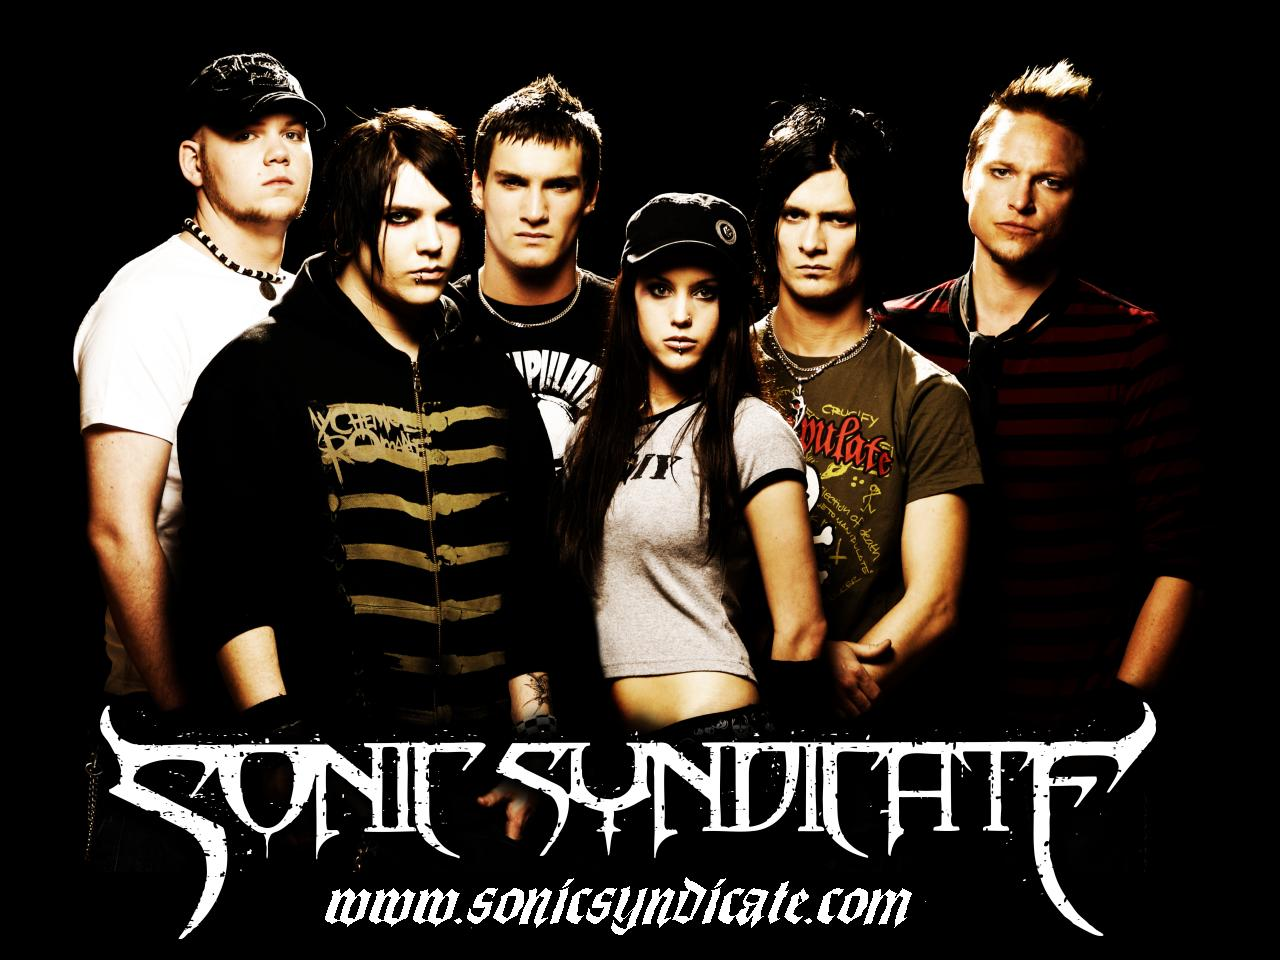 http://4.bp.blogspot.com/_UHfhm5_IRdM/SxROzxUK3ZI/AAAAAAAAAJI/5QYgJJOXsQI/s1600/sonic_syndicate_wallpaper05_1280_960.jpg